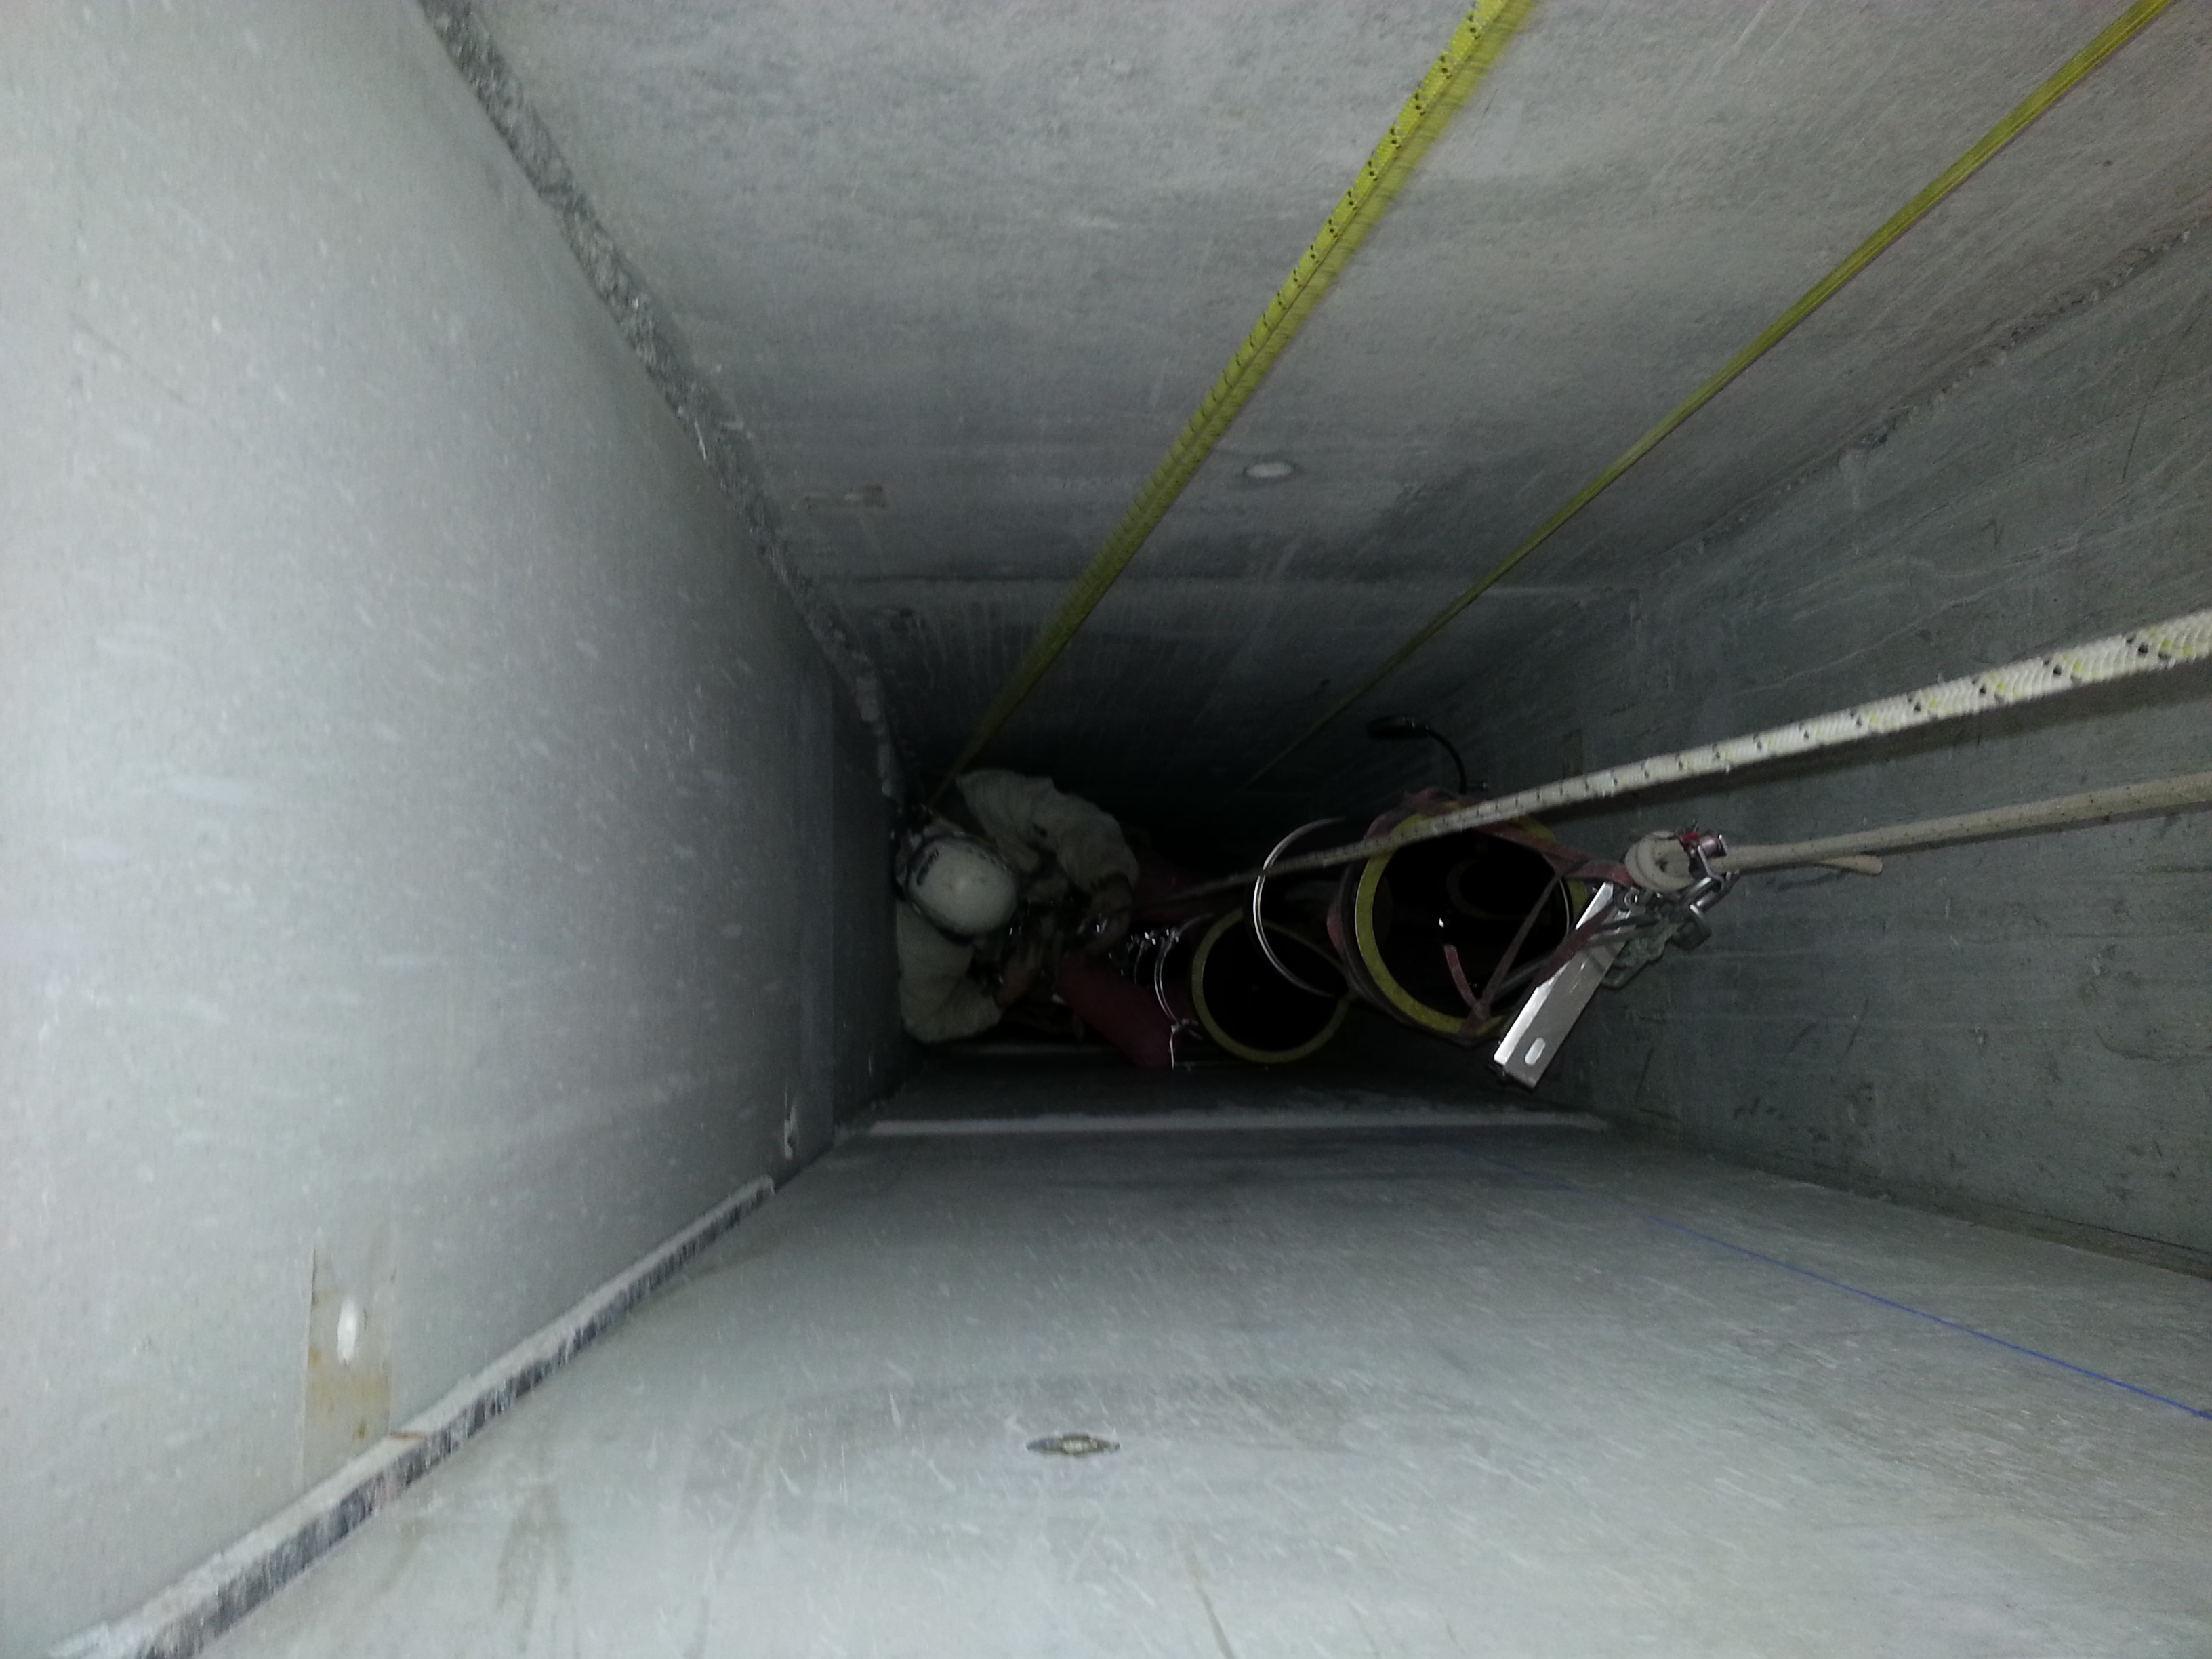 Installation tubage sur 30m